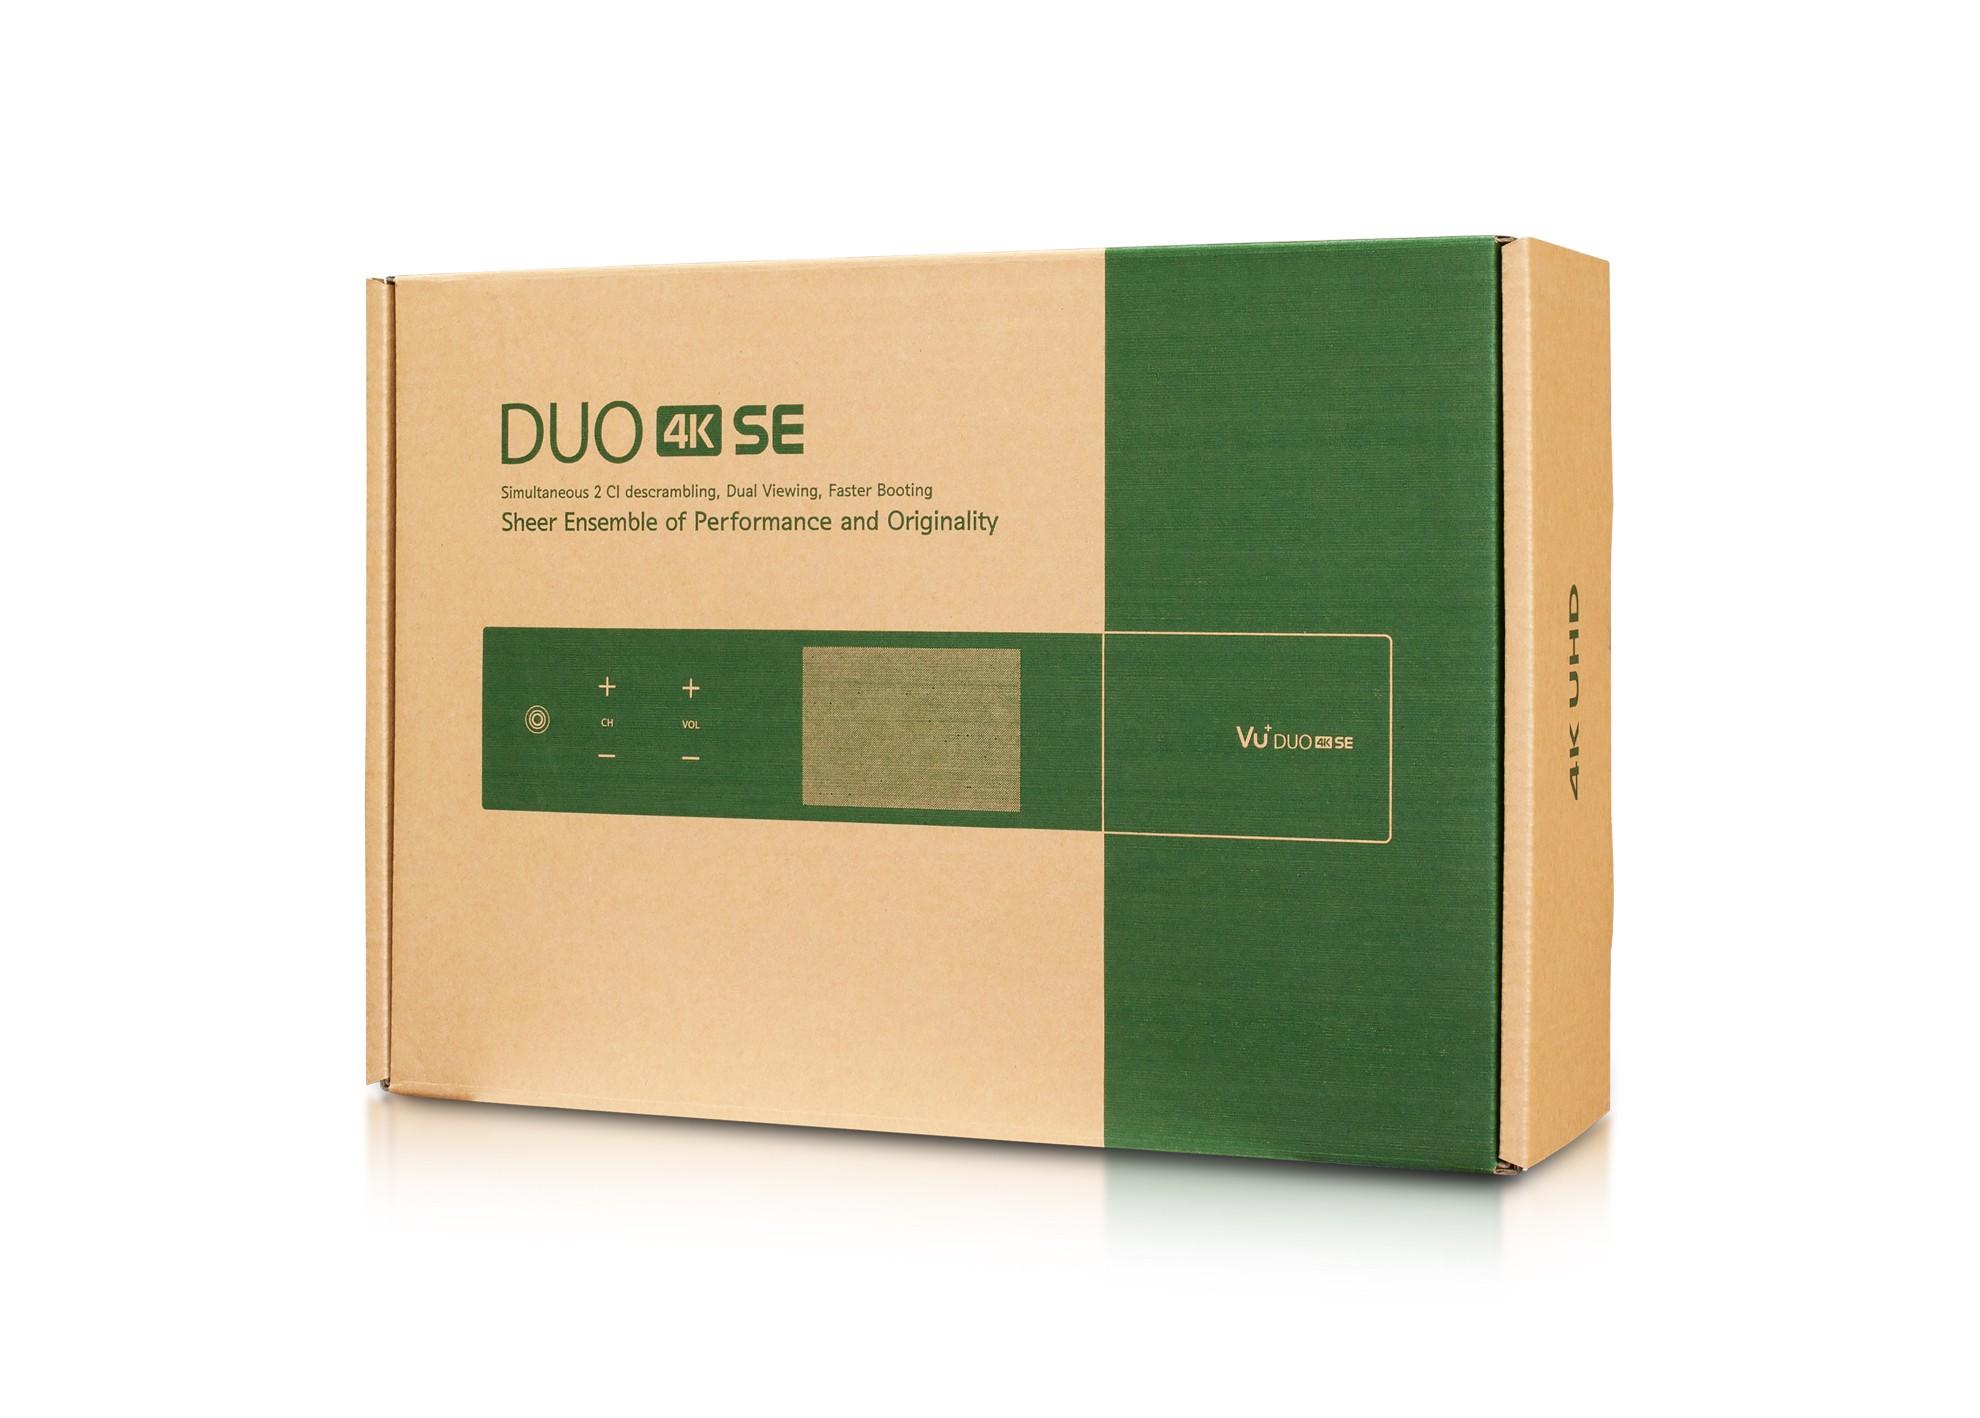 VU+ DUO 4K SE (1x Dual FBC S2X tuner)